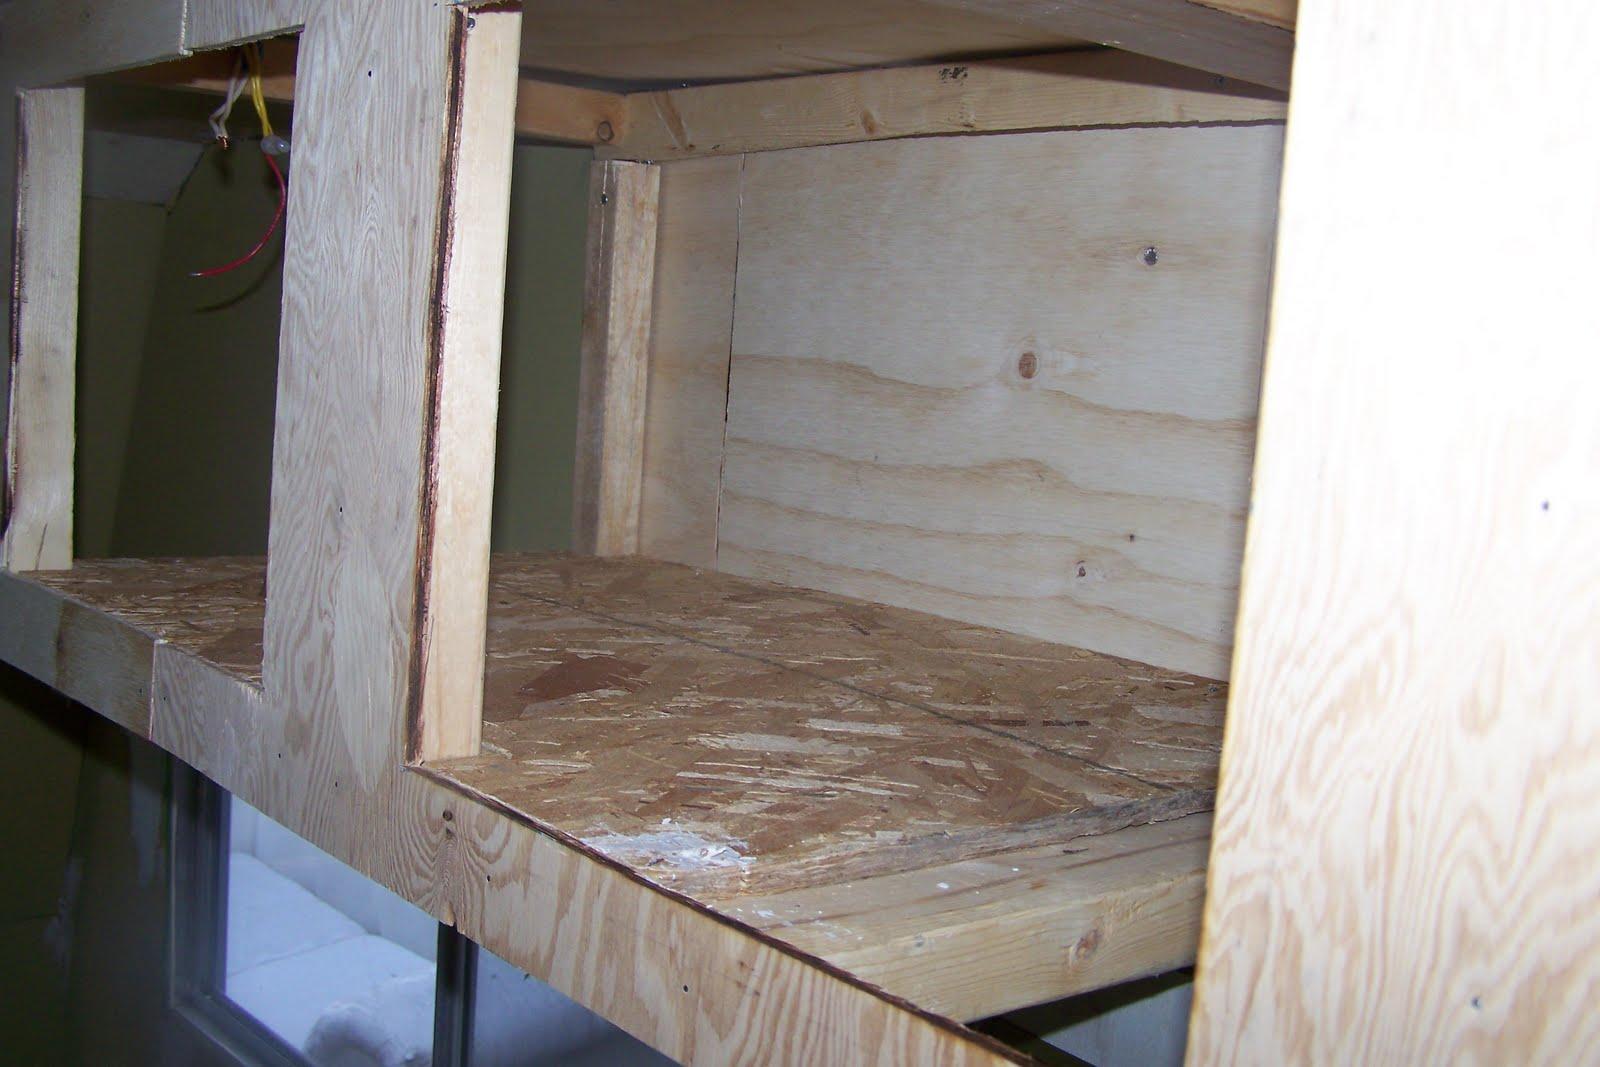 Cool 1977 Gmc Kokanee Rv Rebuild Kitchen Cabinet Continued 2 Download Free Architecture Designs Scobabritishbridgeorg